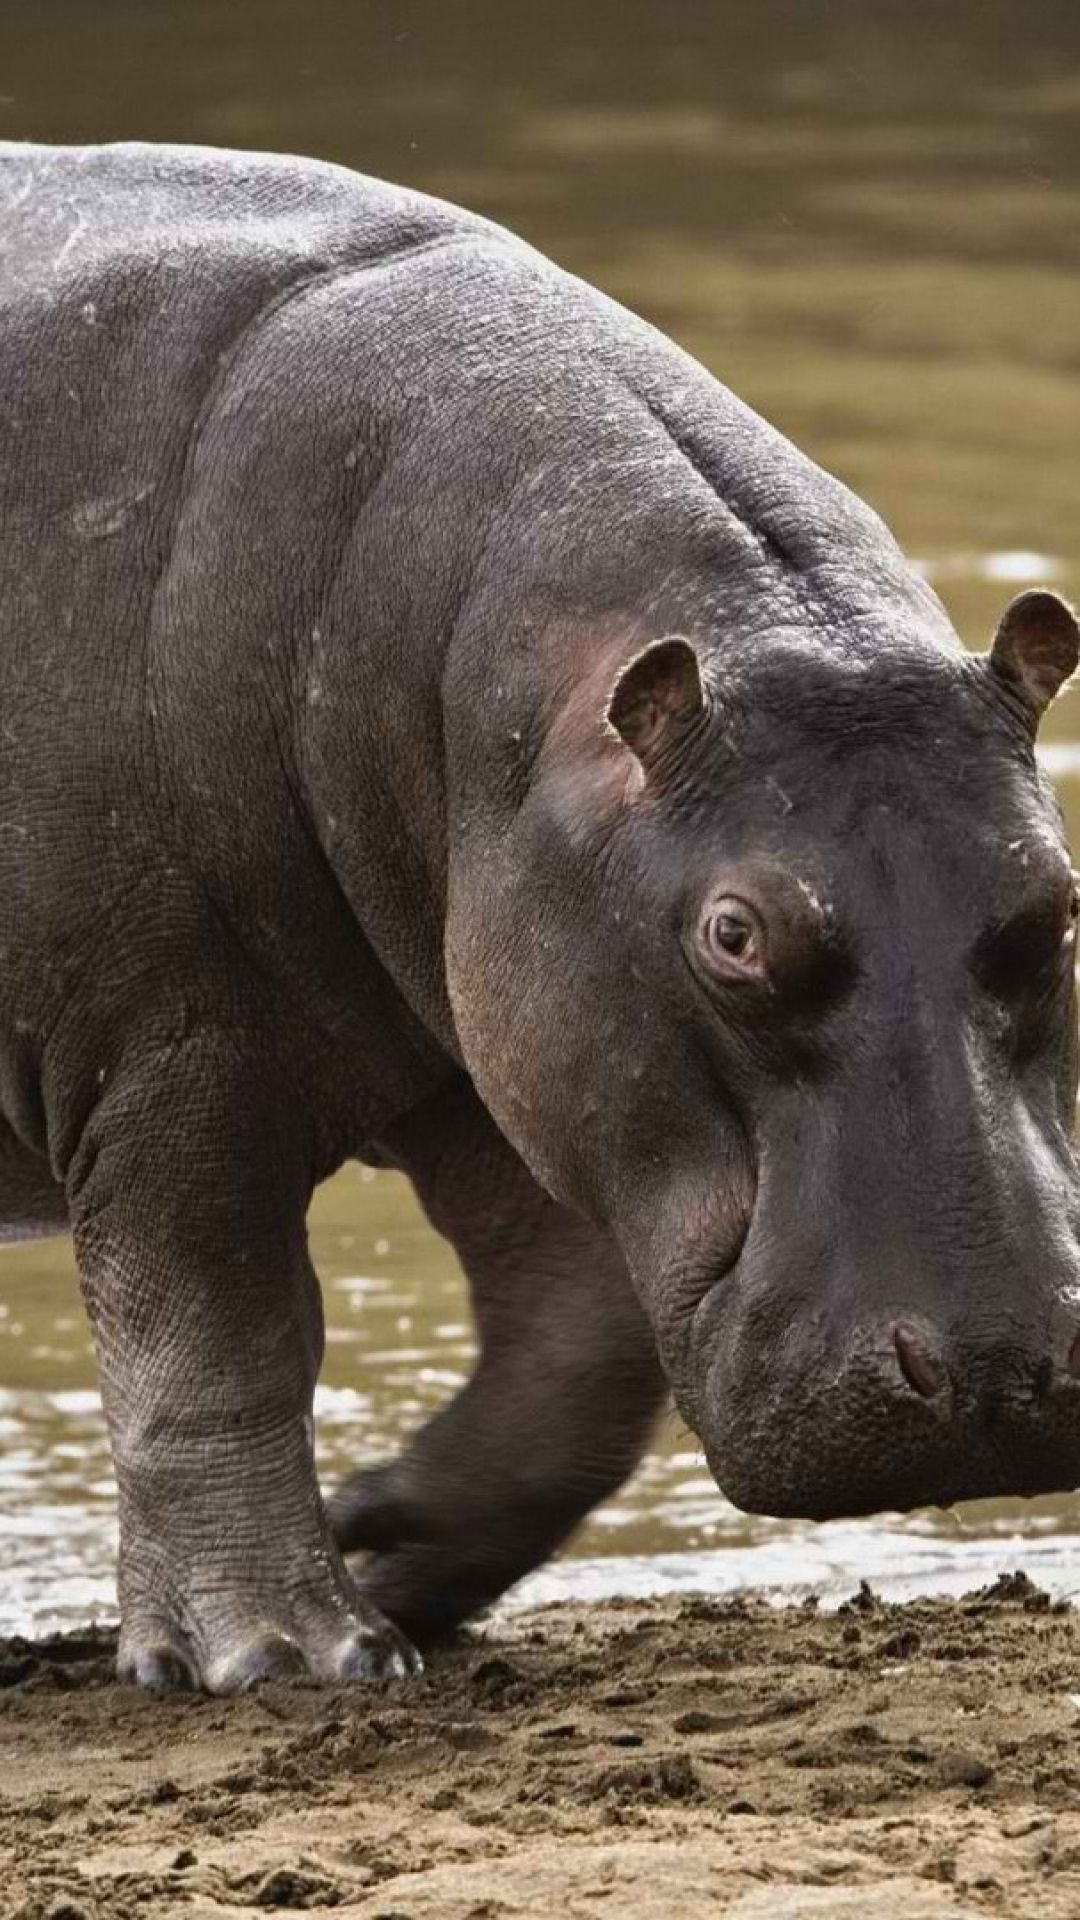 Download Wallpaper 1080x1920 Hippopotamus Beach Water Gray Huge Sony Xperia Z1 Zl Z Samsung Galaxy S4 Ht Hippopotamus Animals Beautiful African Animals